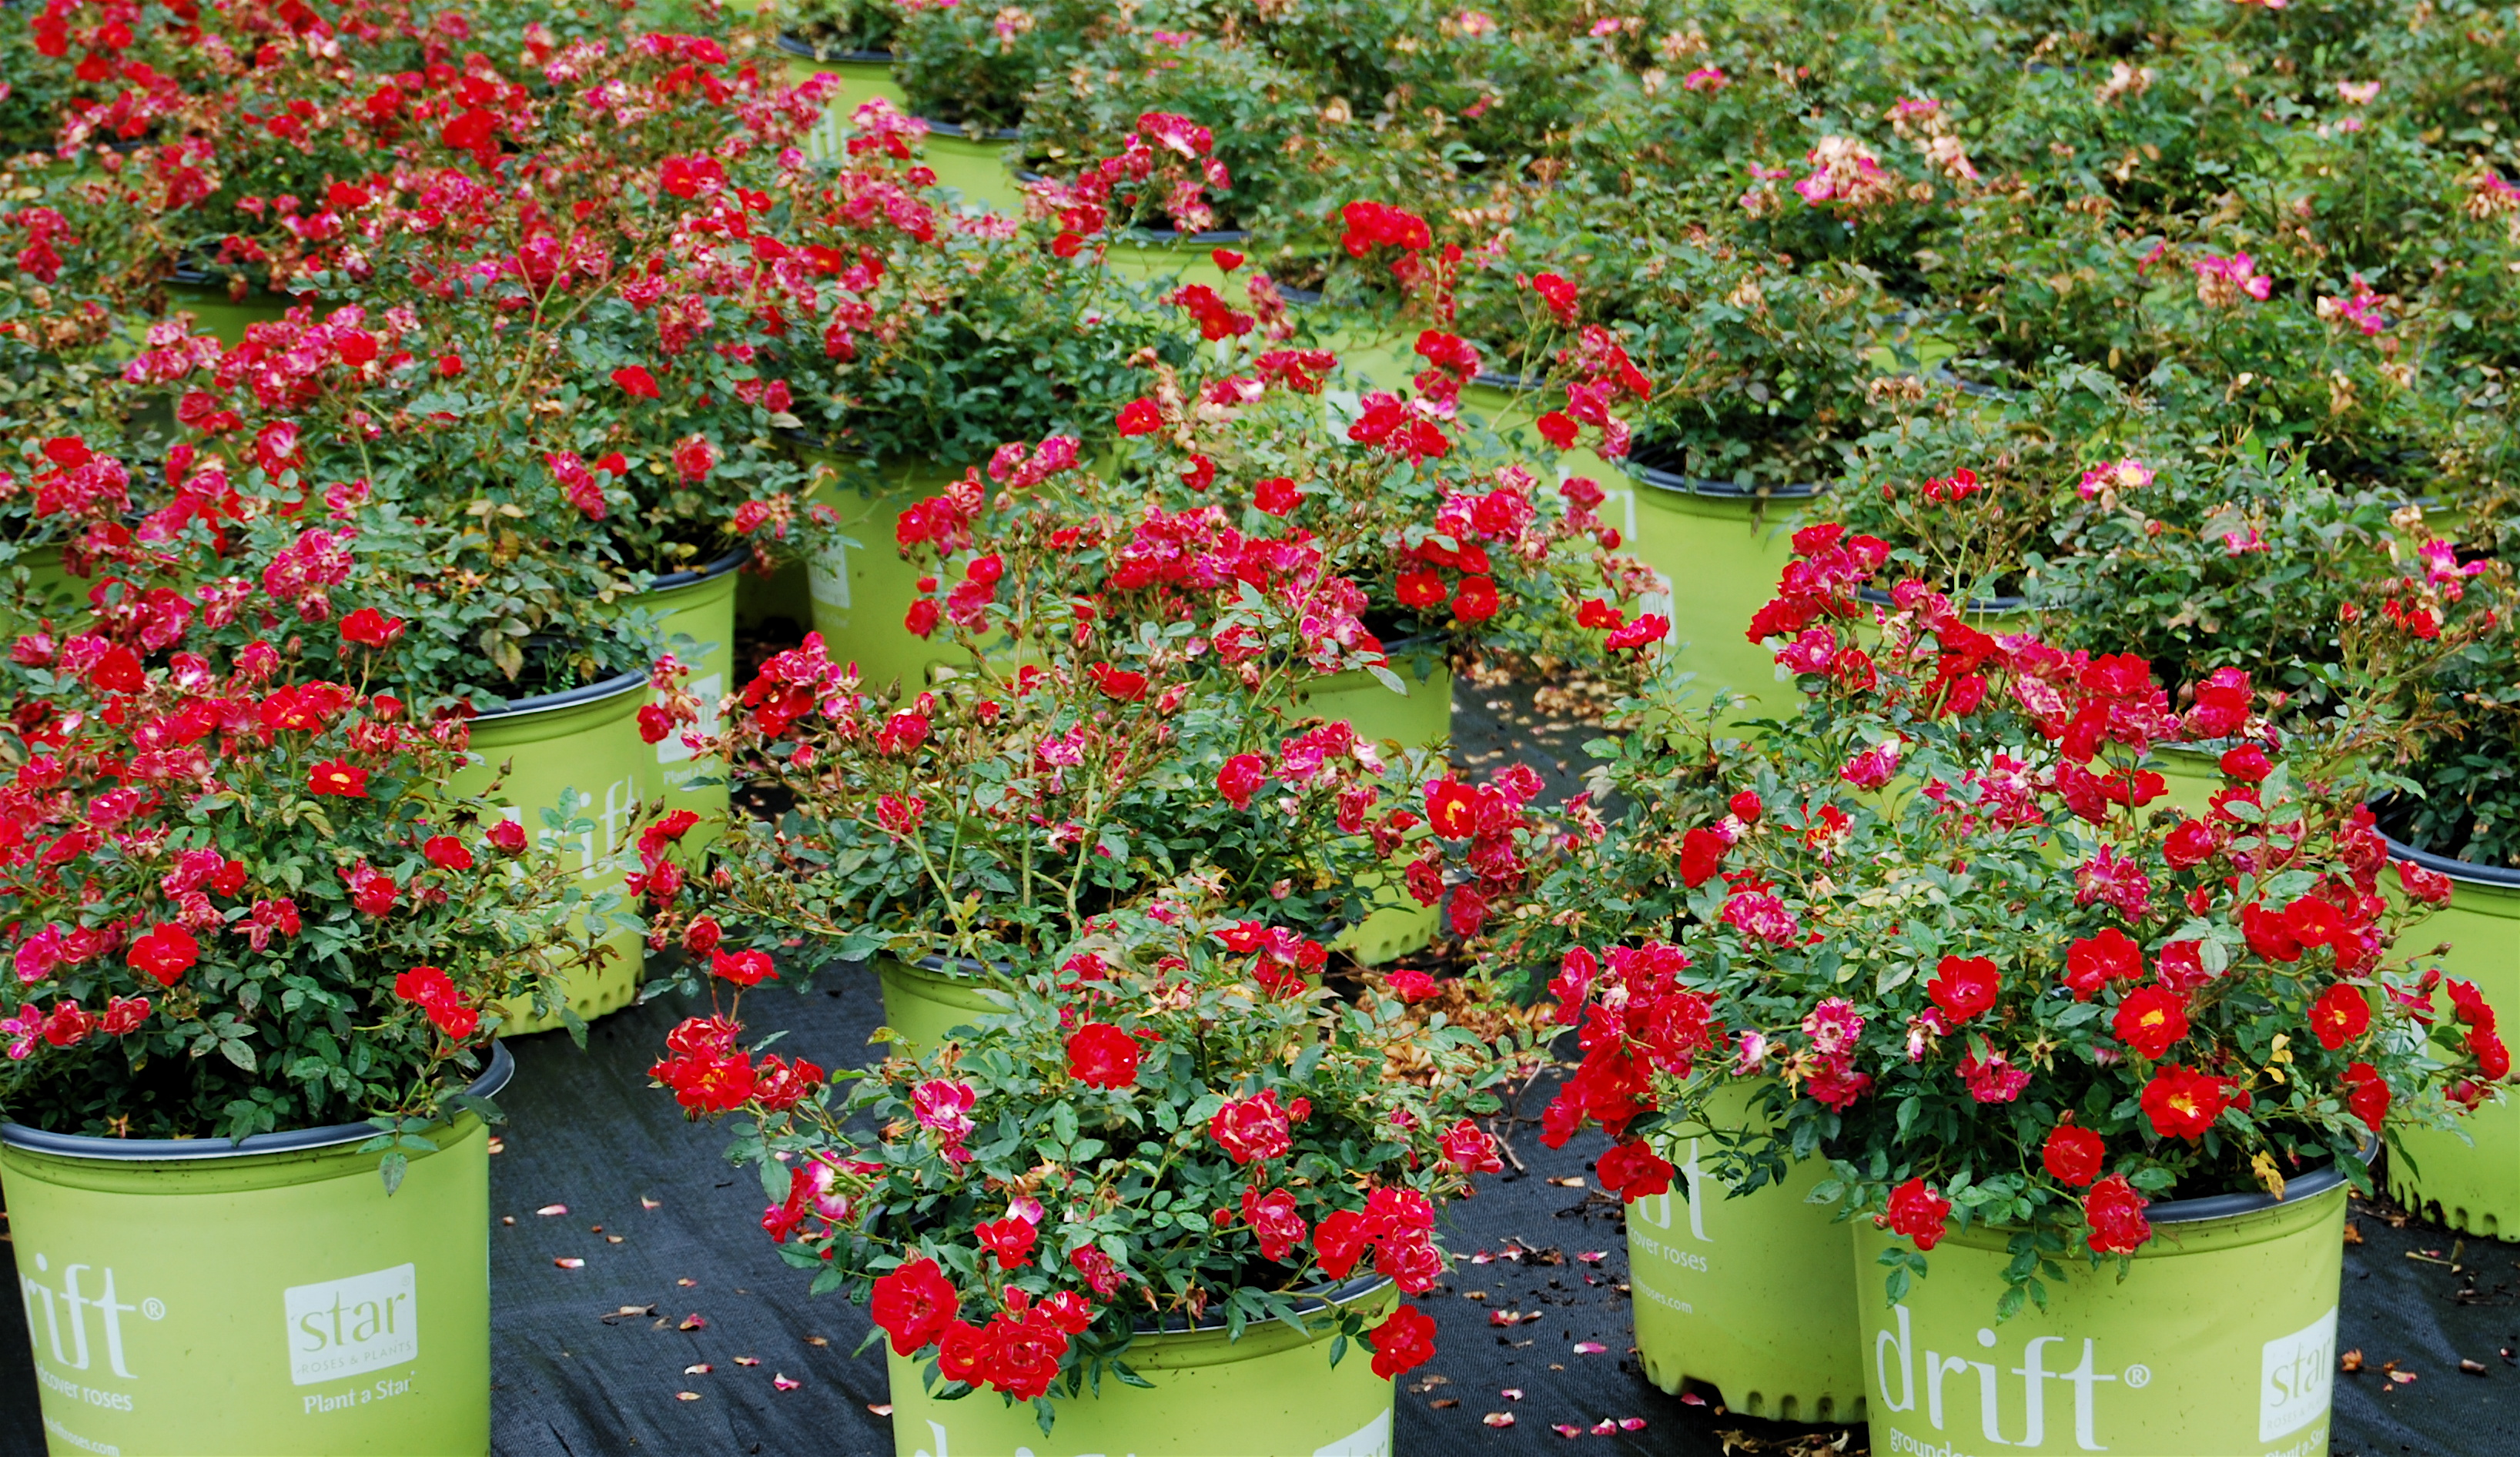 Veronica S Nursery Forest Hill Louisiana Whole Plants